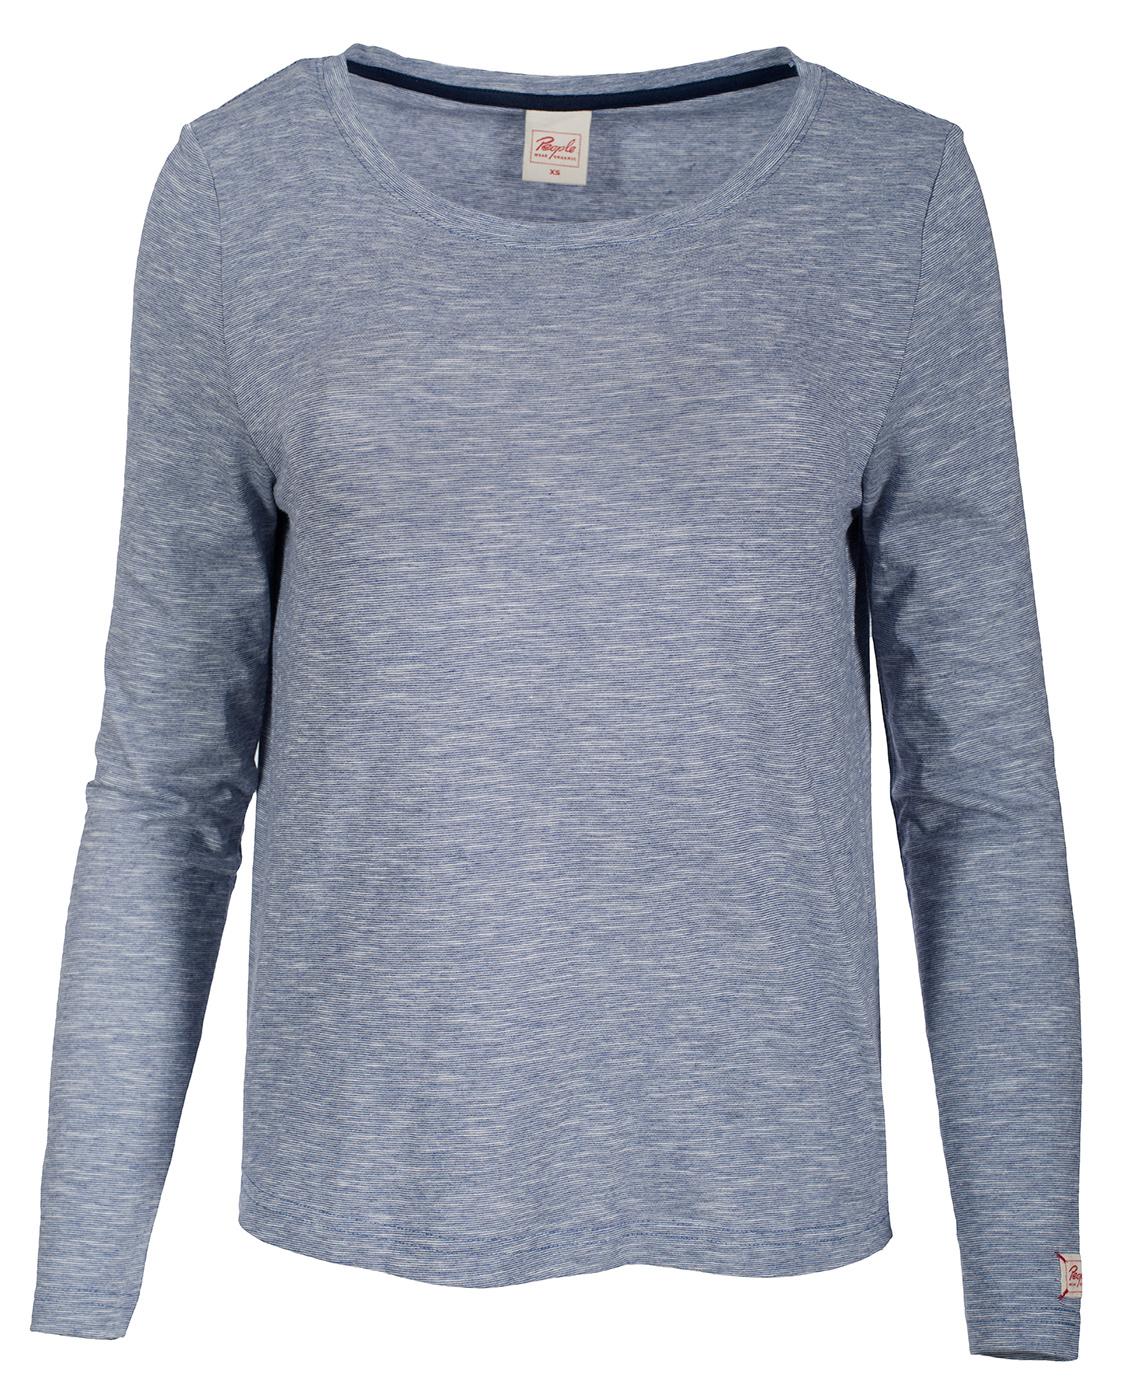 Langarm Shirt, blue melange